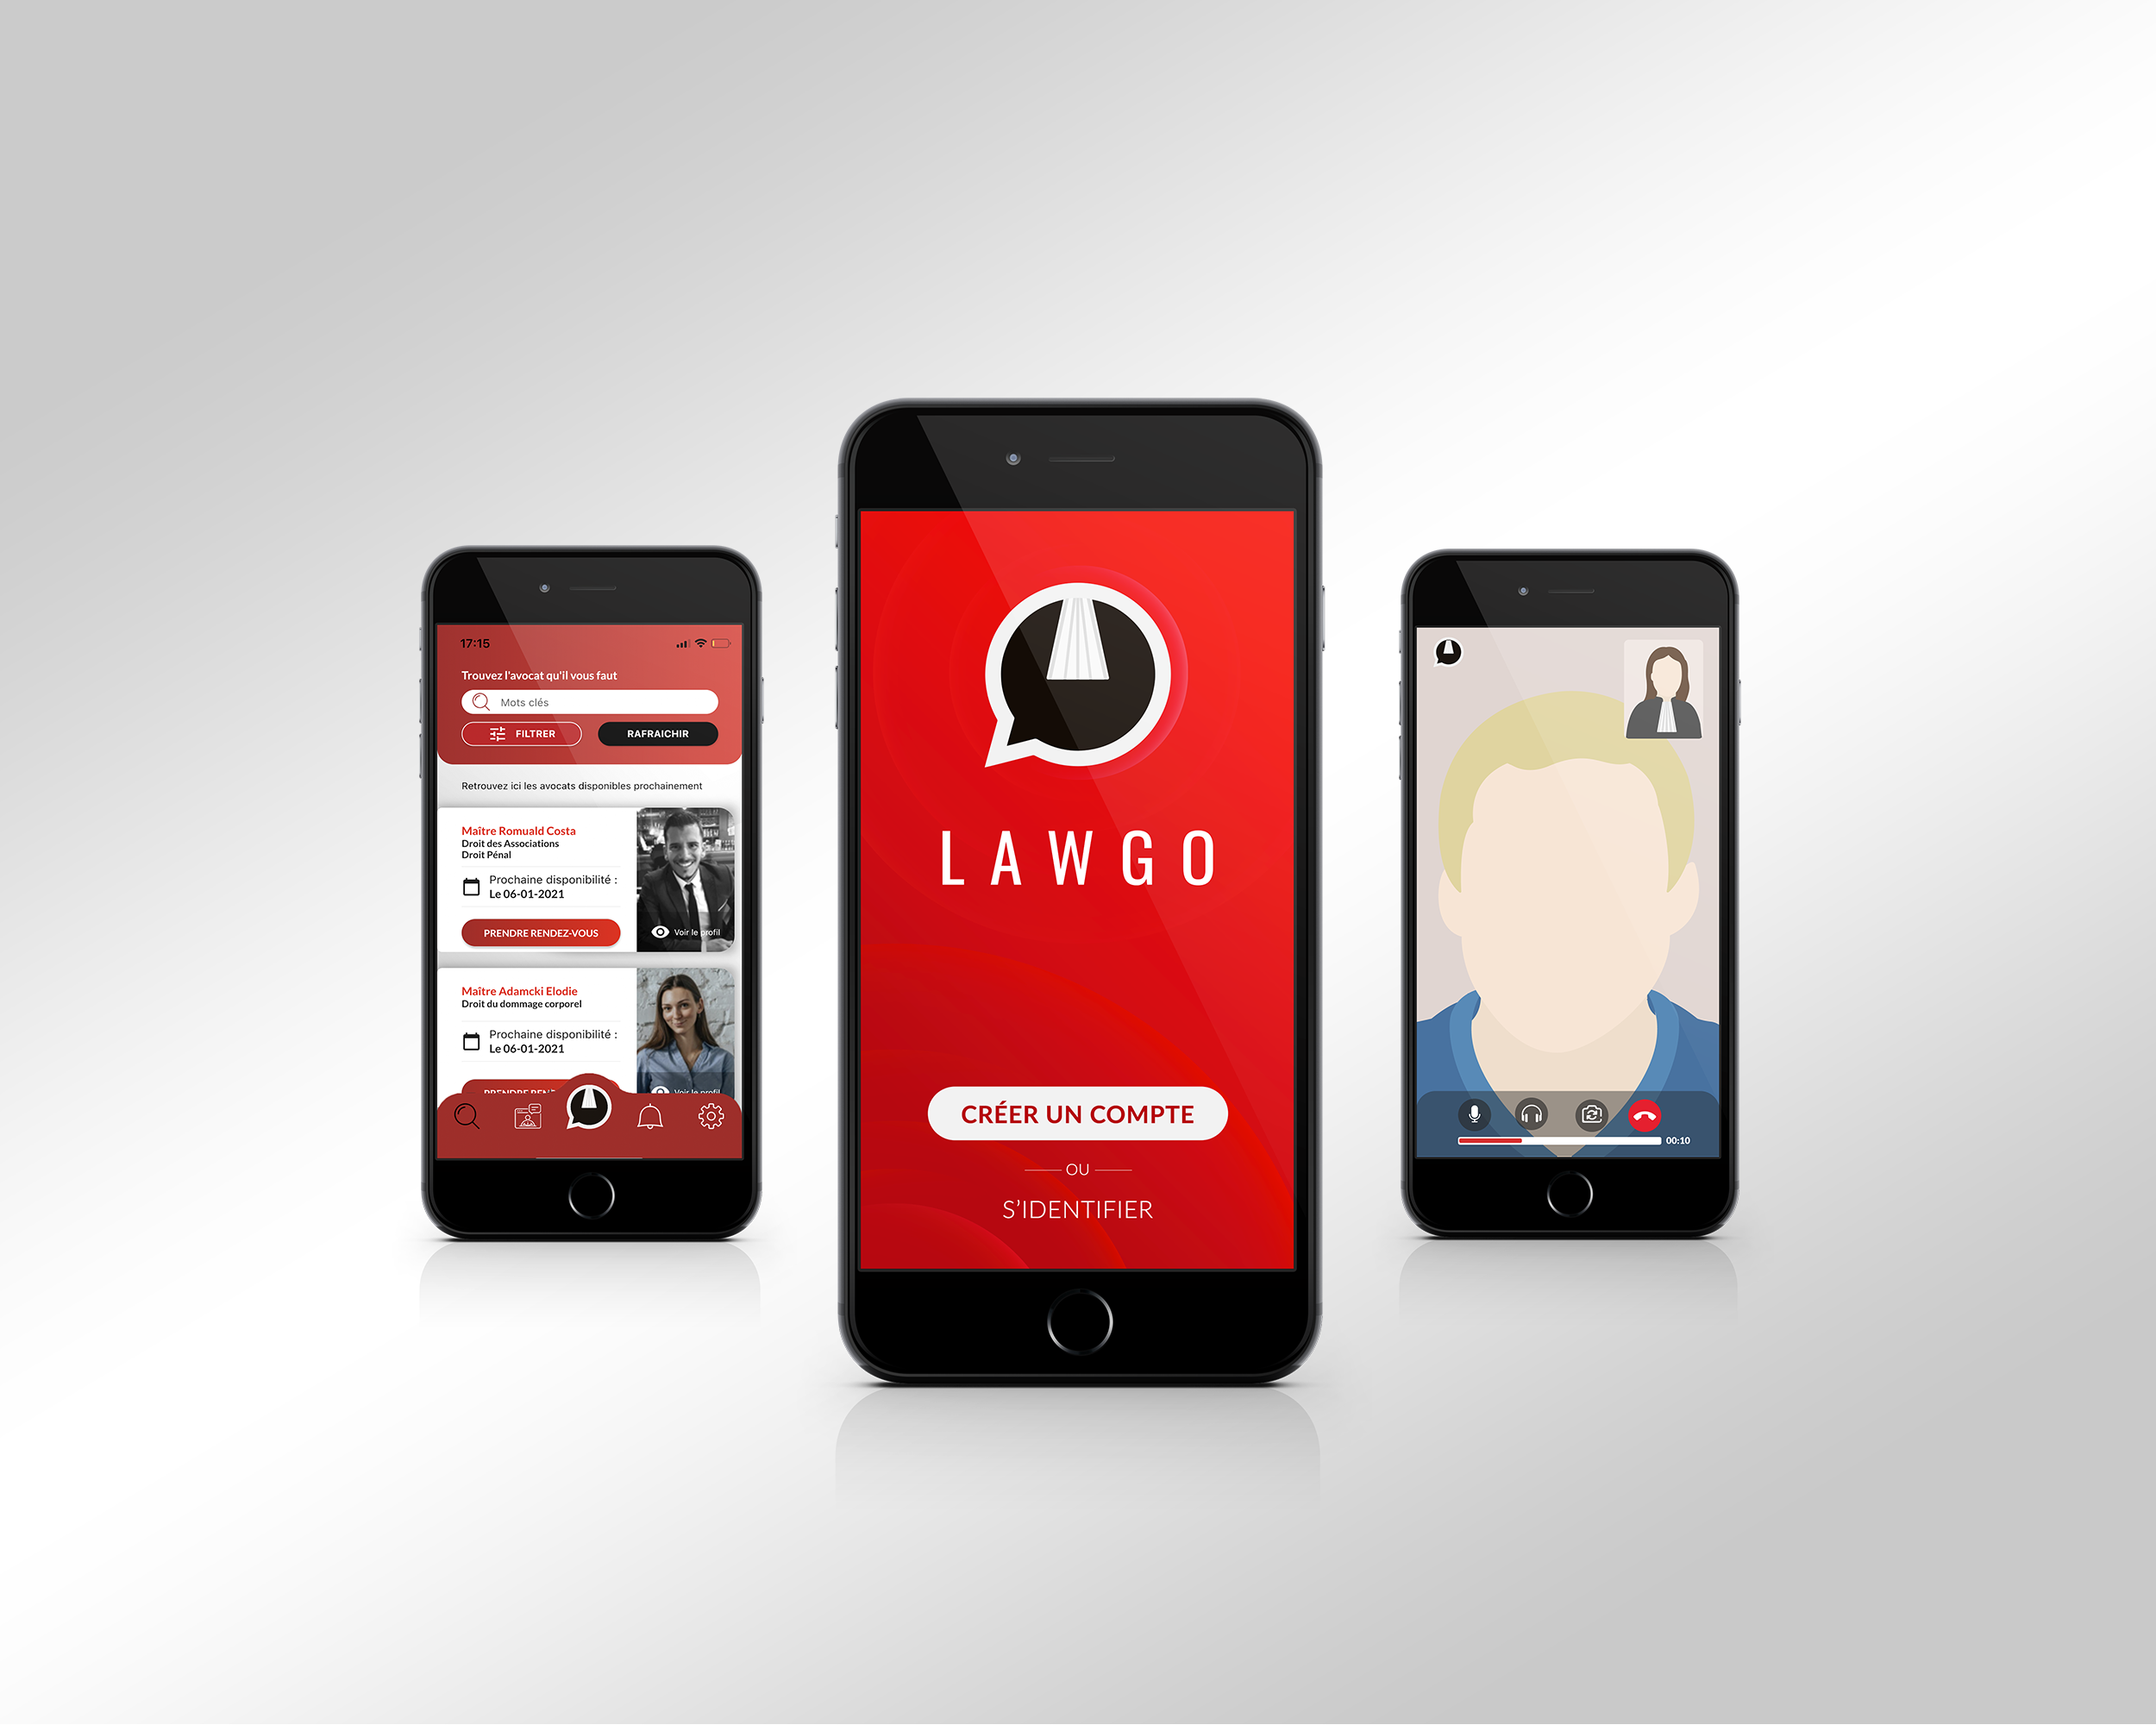 LAWGO   App iOS & Androïd [FLUTTER] - Application mobile